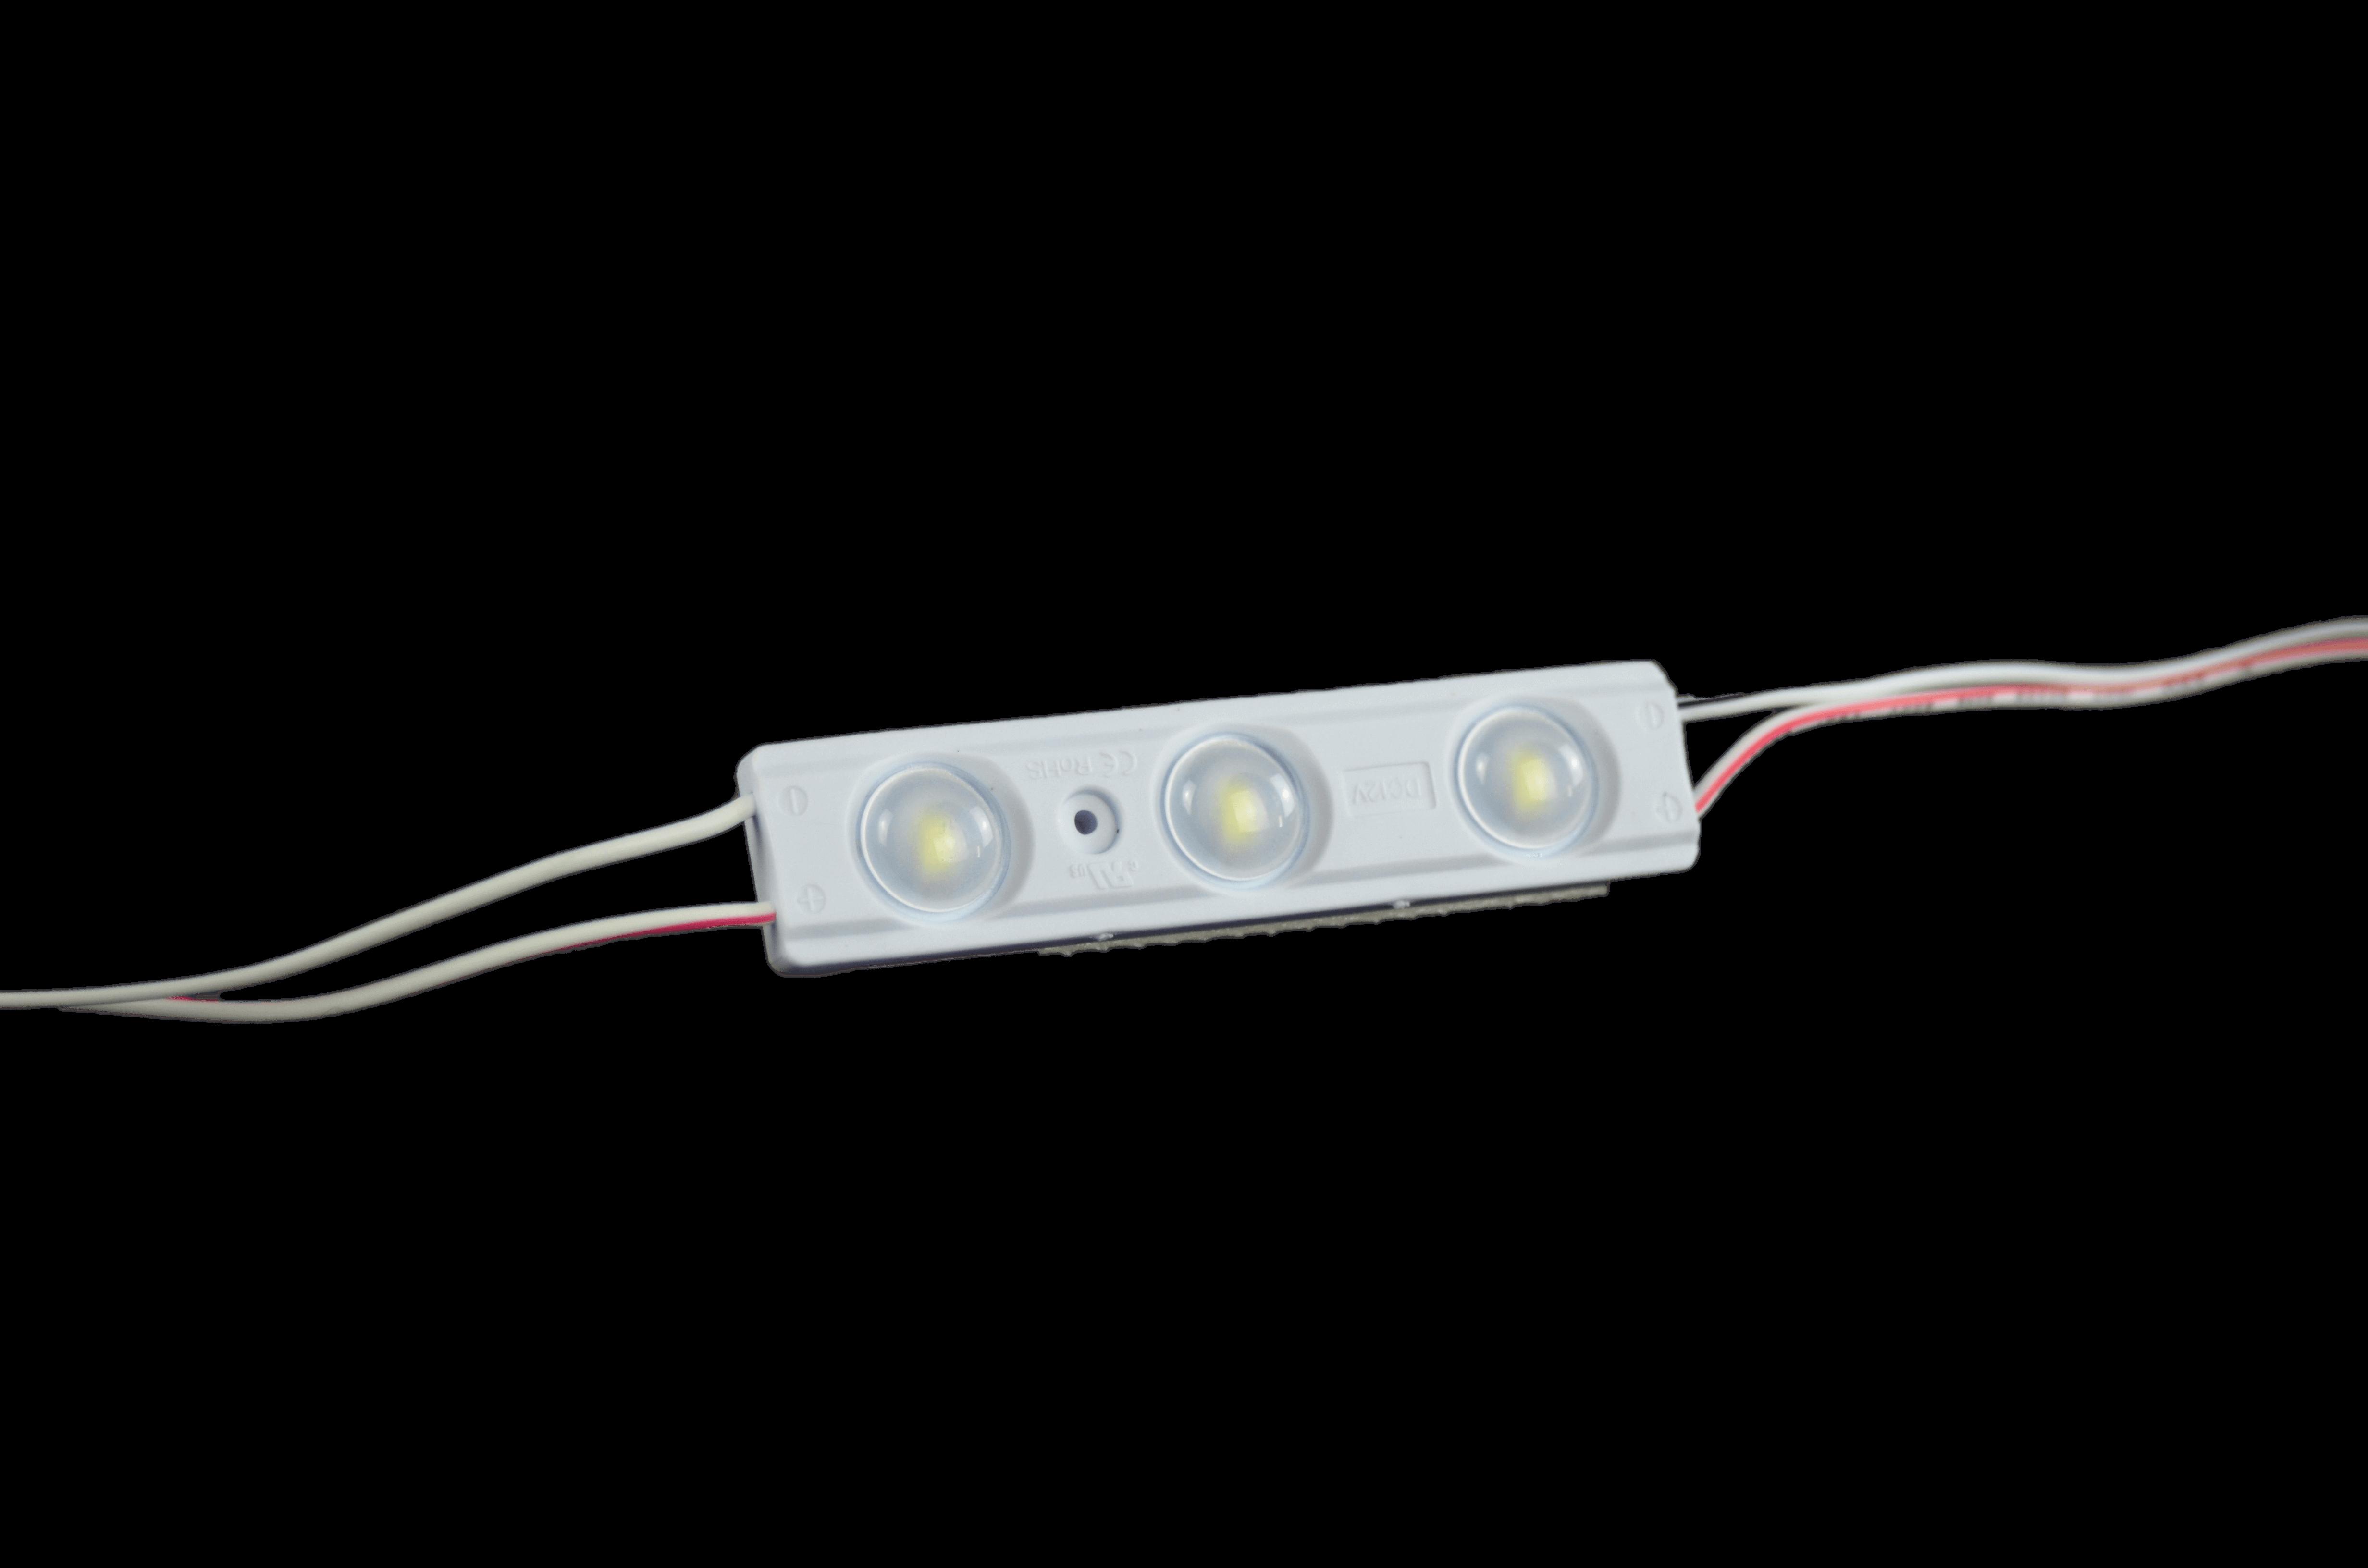 Modulo LED due B&B Systems